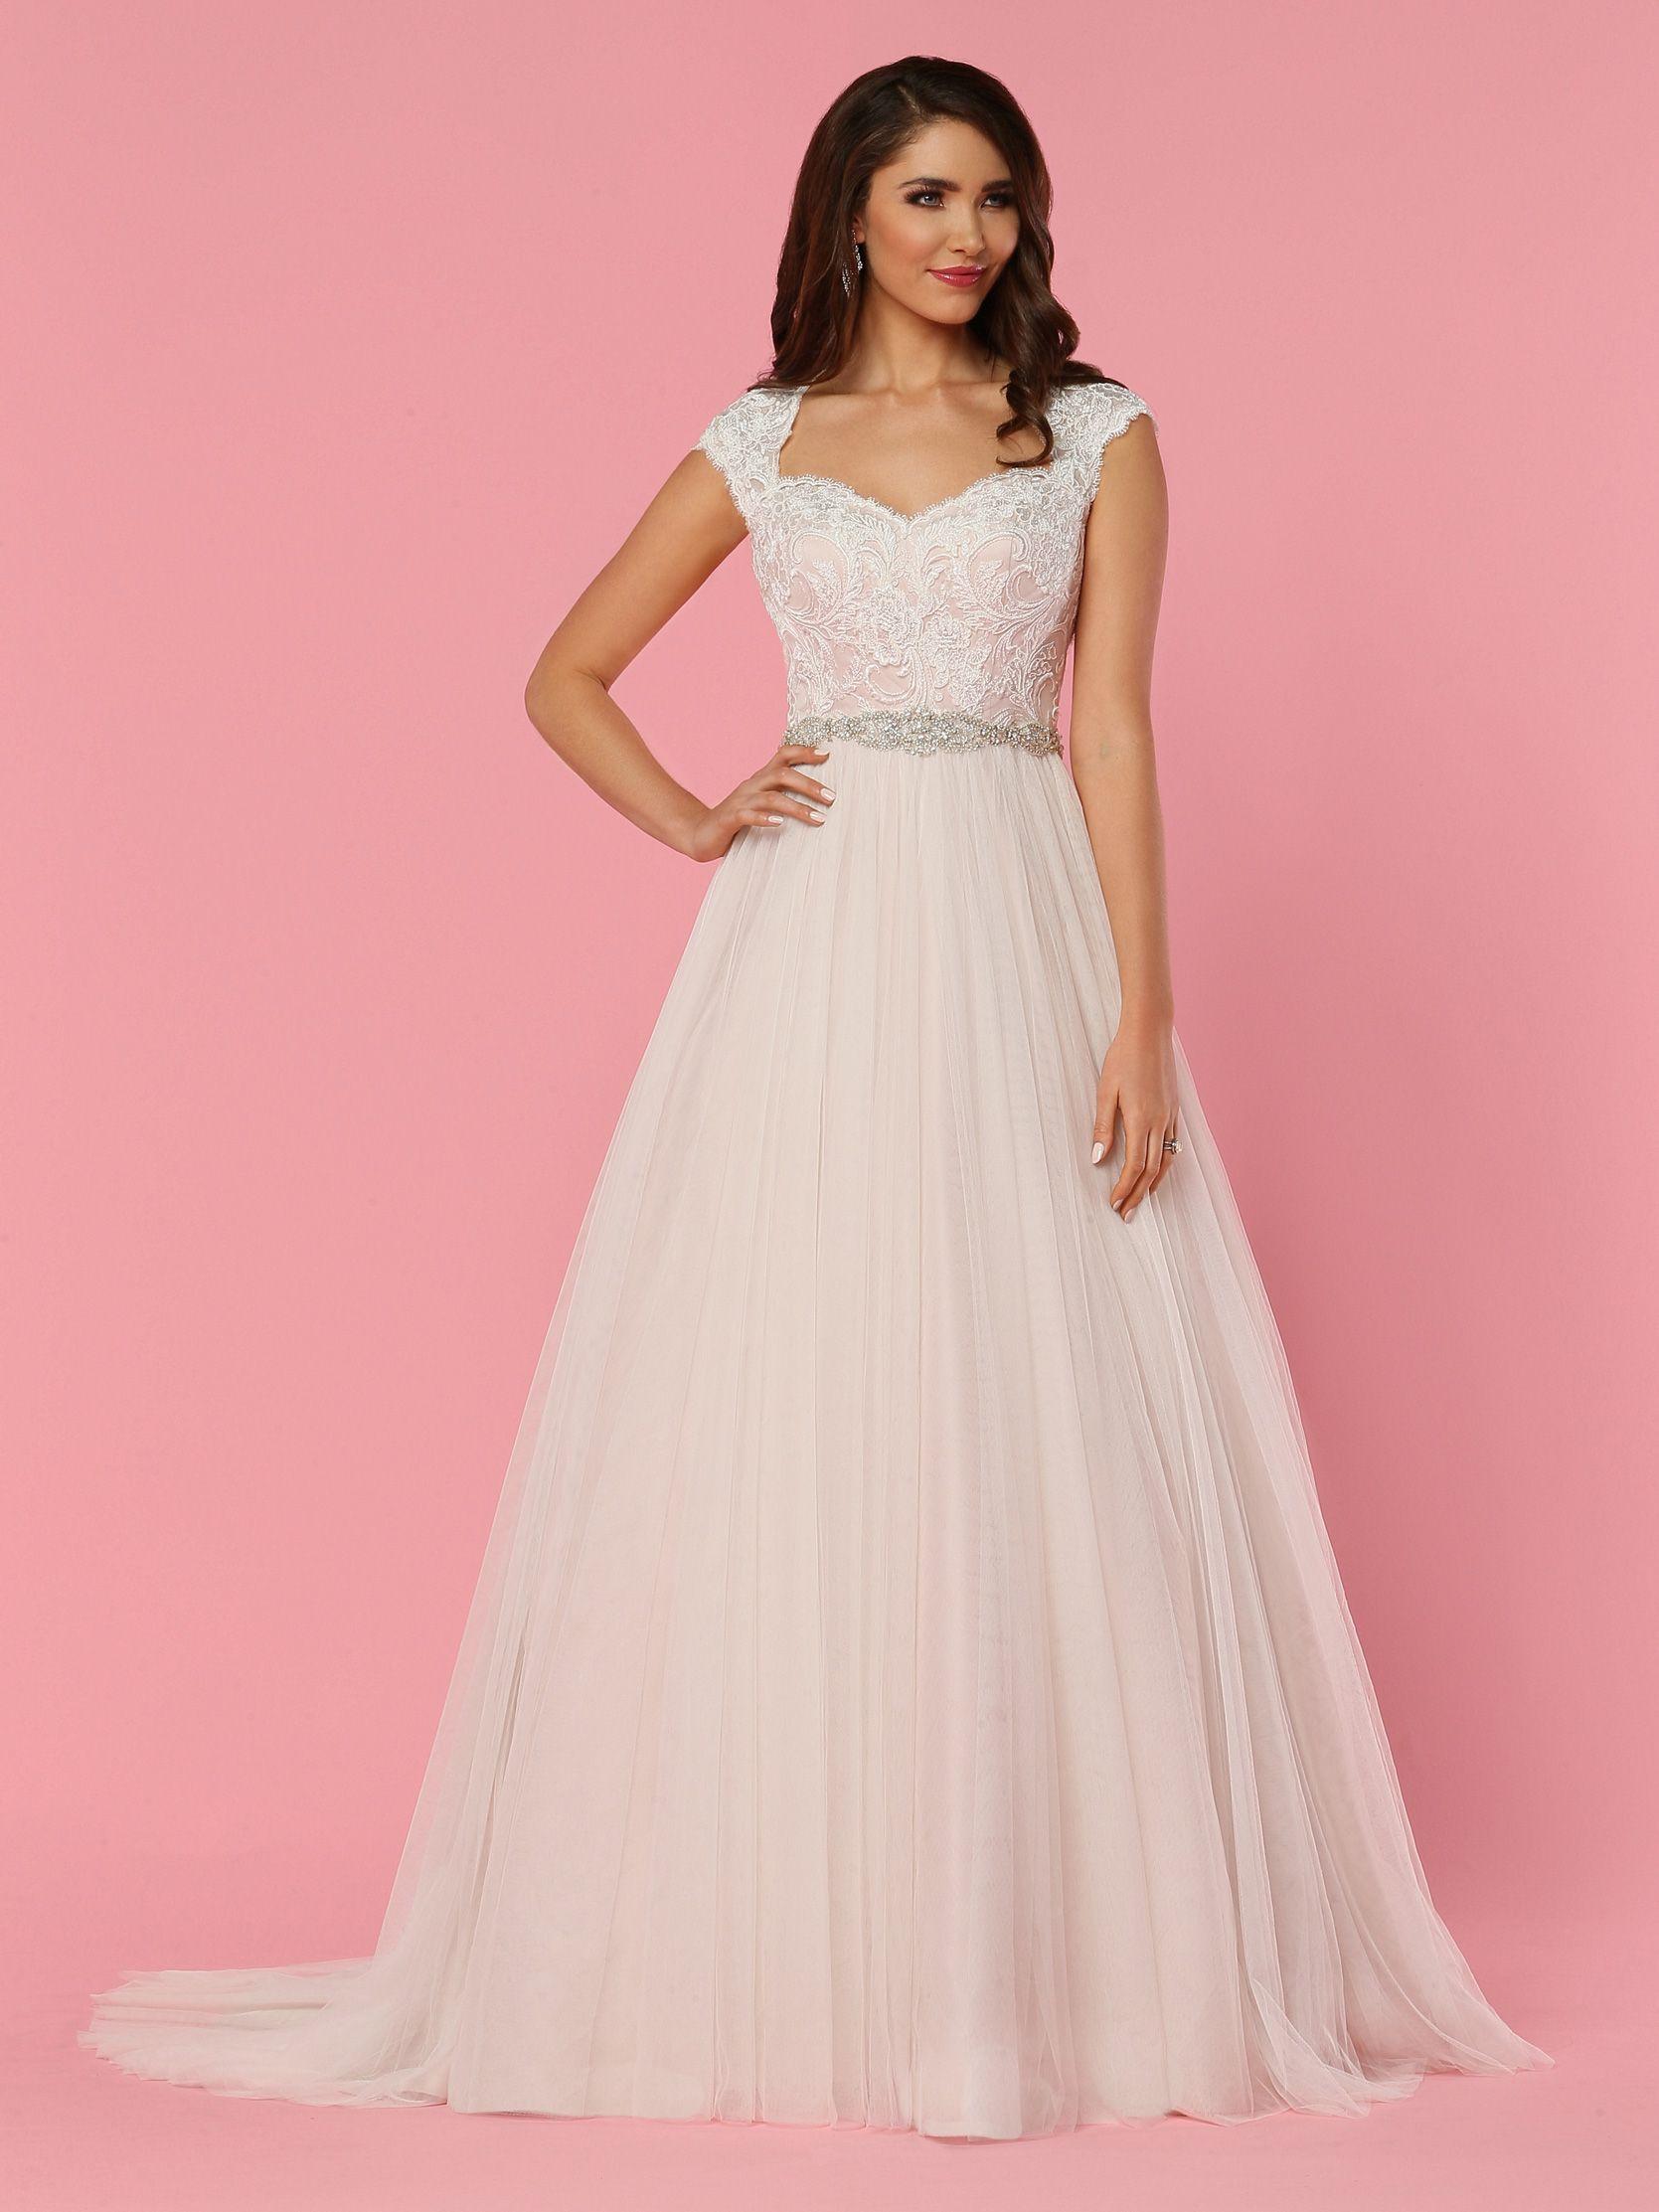 Pin de The Wedding Connection en New Wedding Gowns | Pinterest